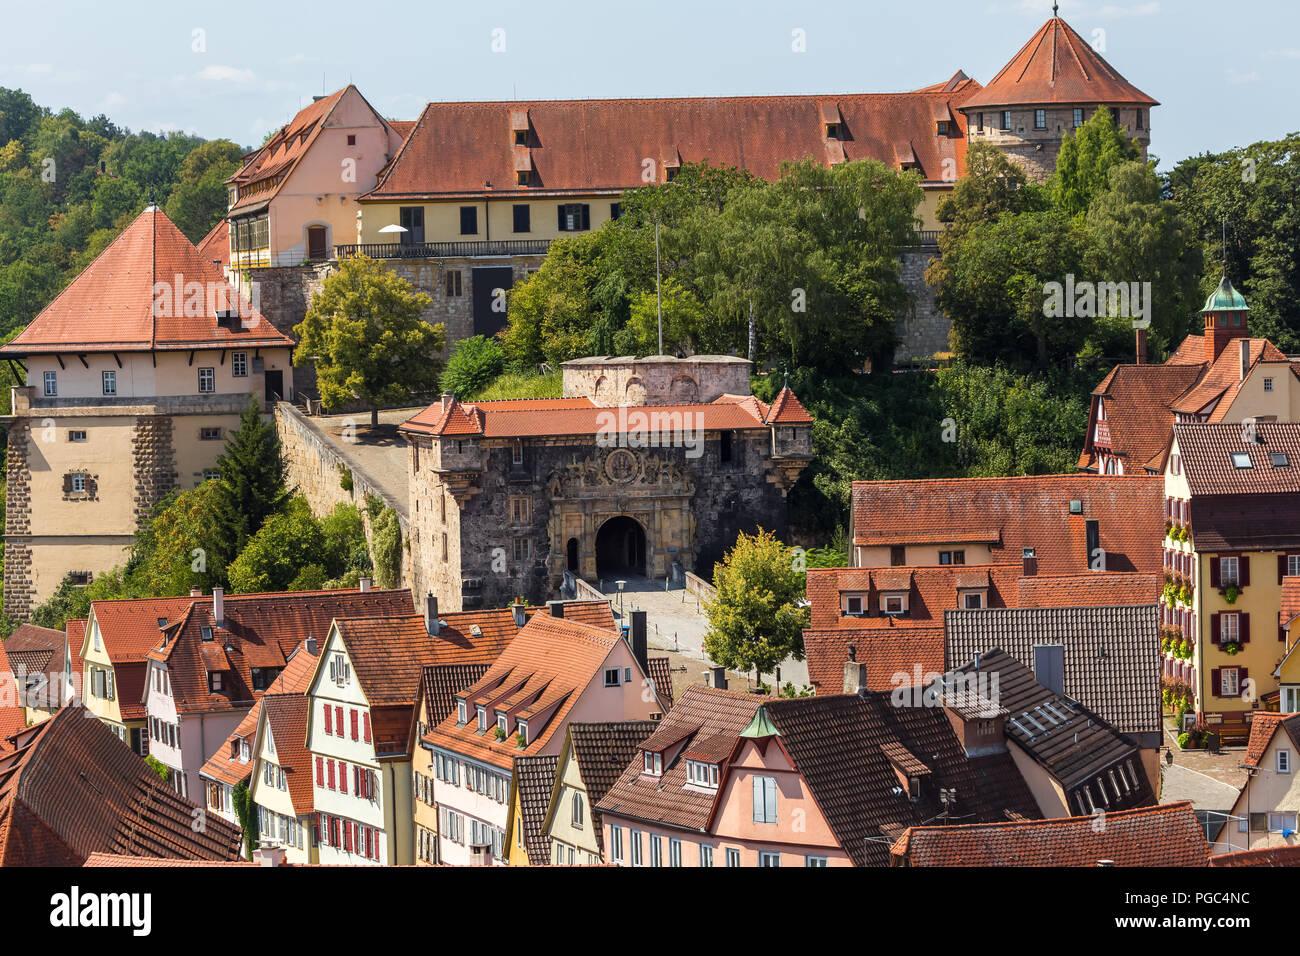 castle tuebingen germany - Stock Image